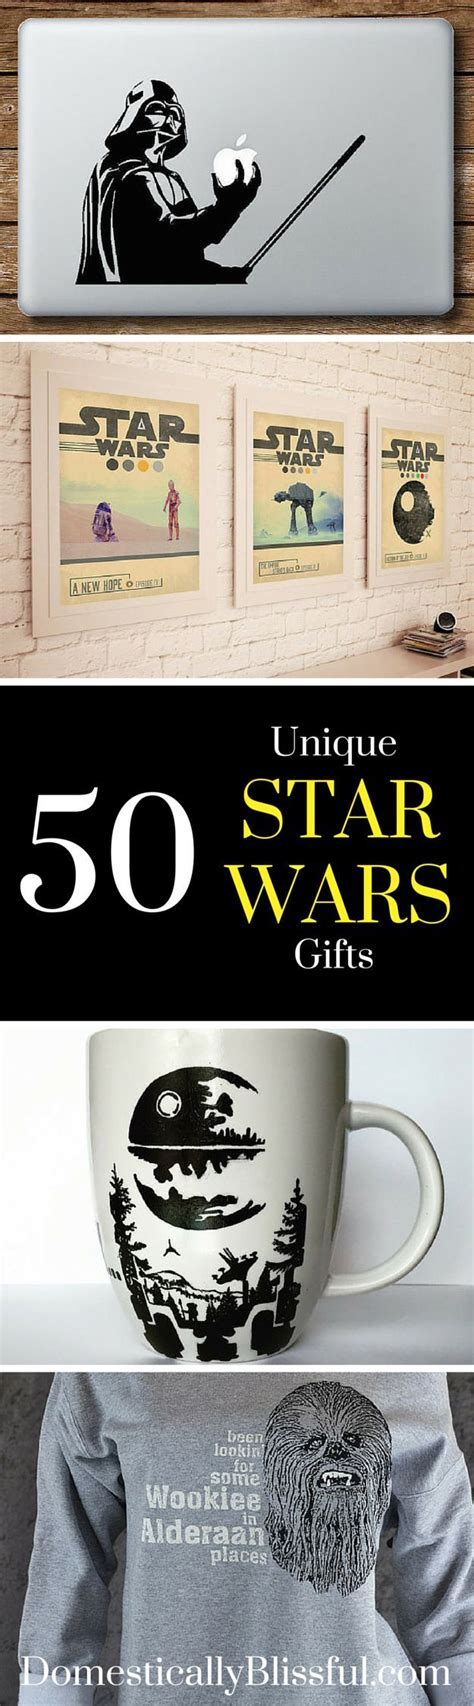 best wars gifts 50 unique wars gifts